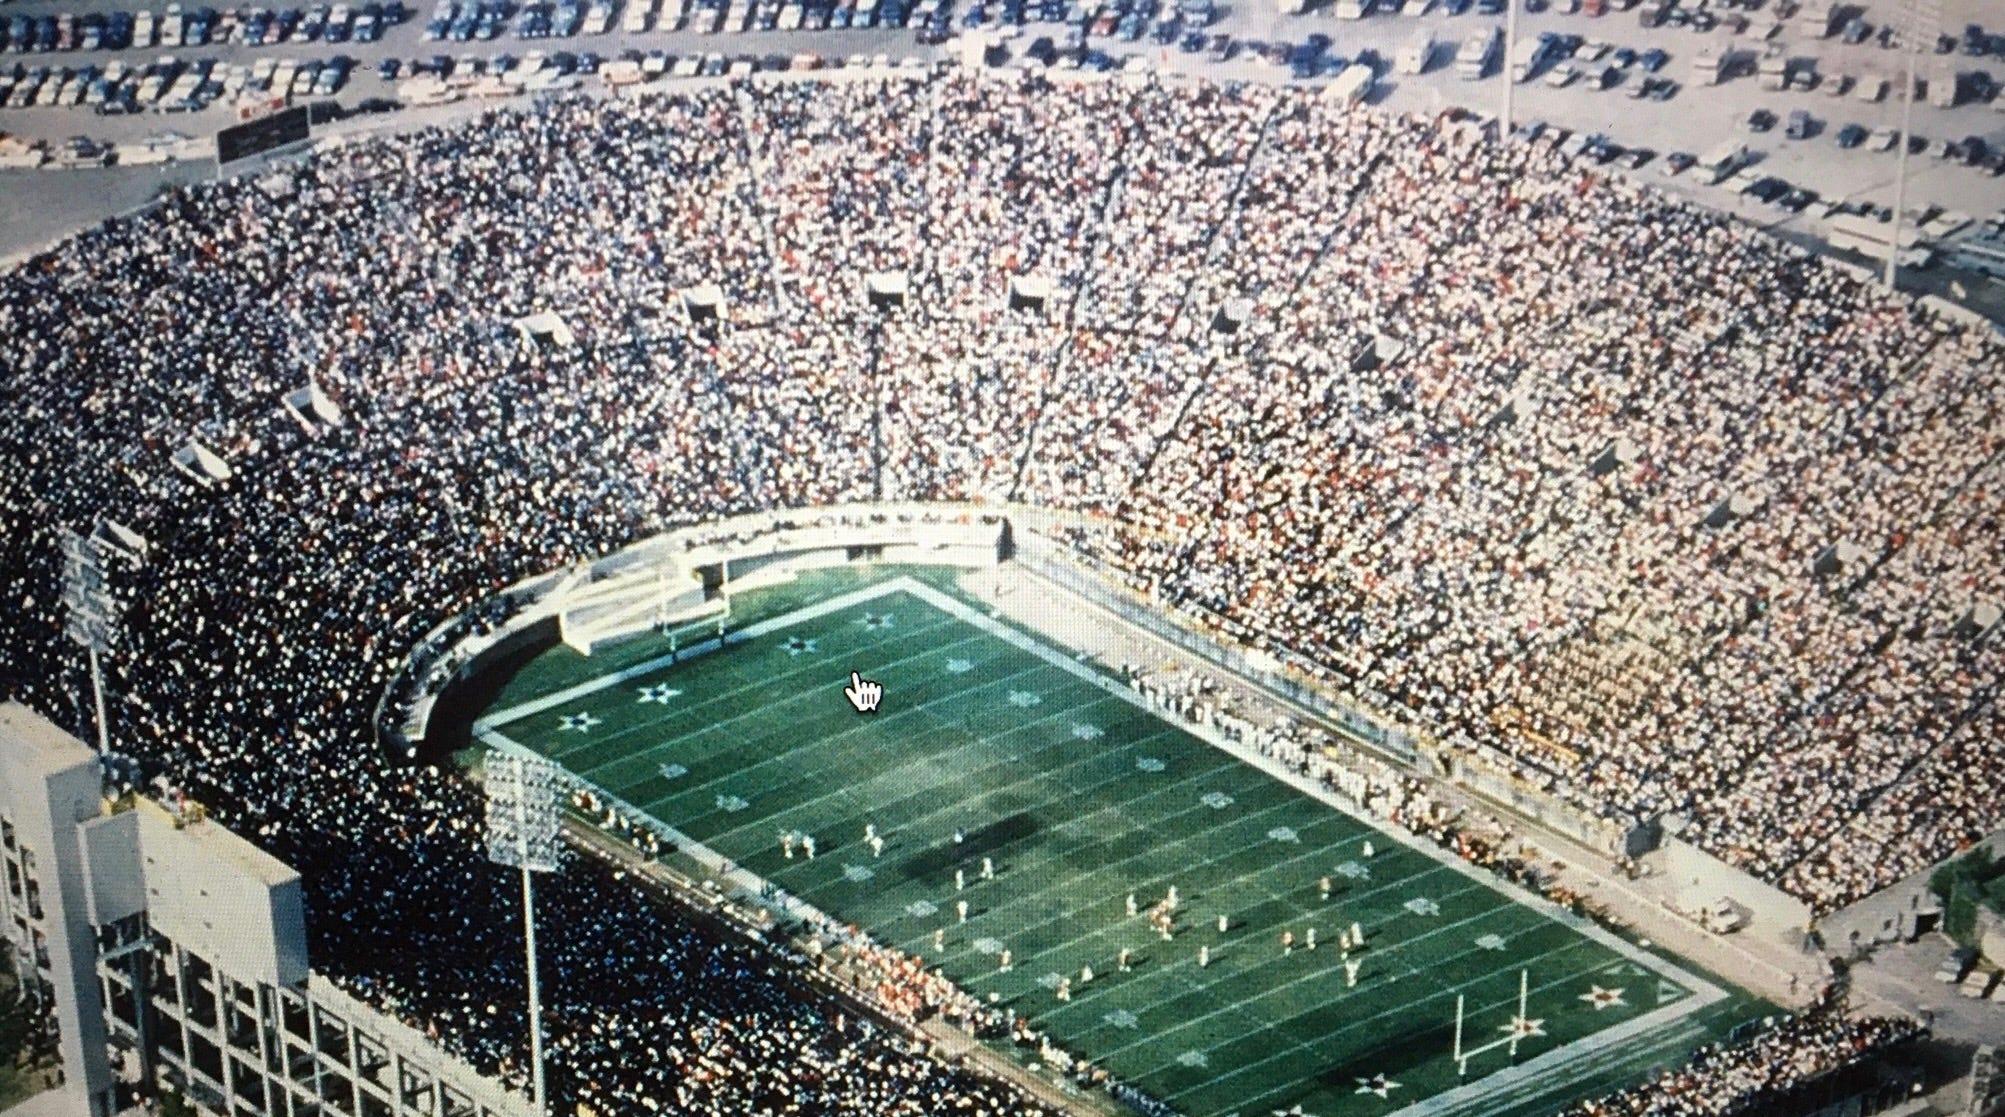 The Vet: New documentary looks at the stunning history of the Jackson stadium